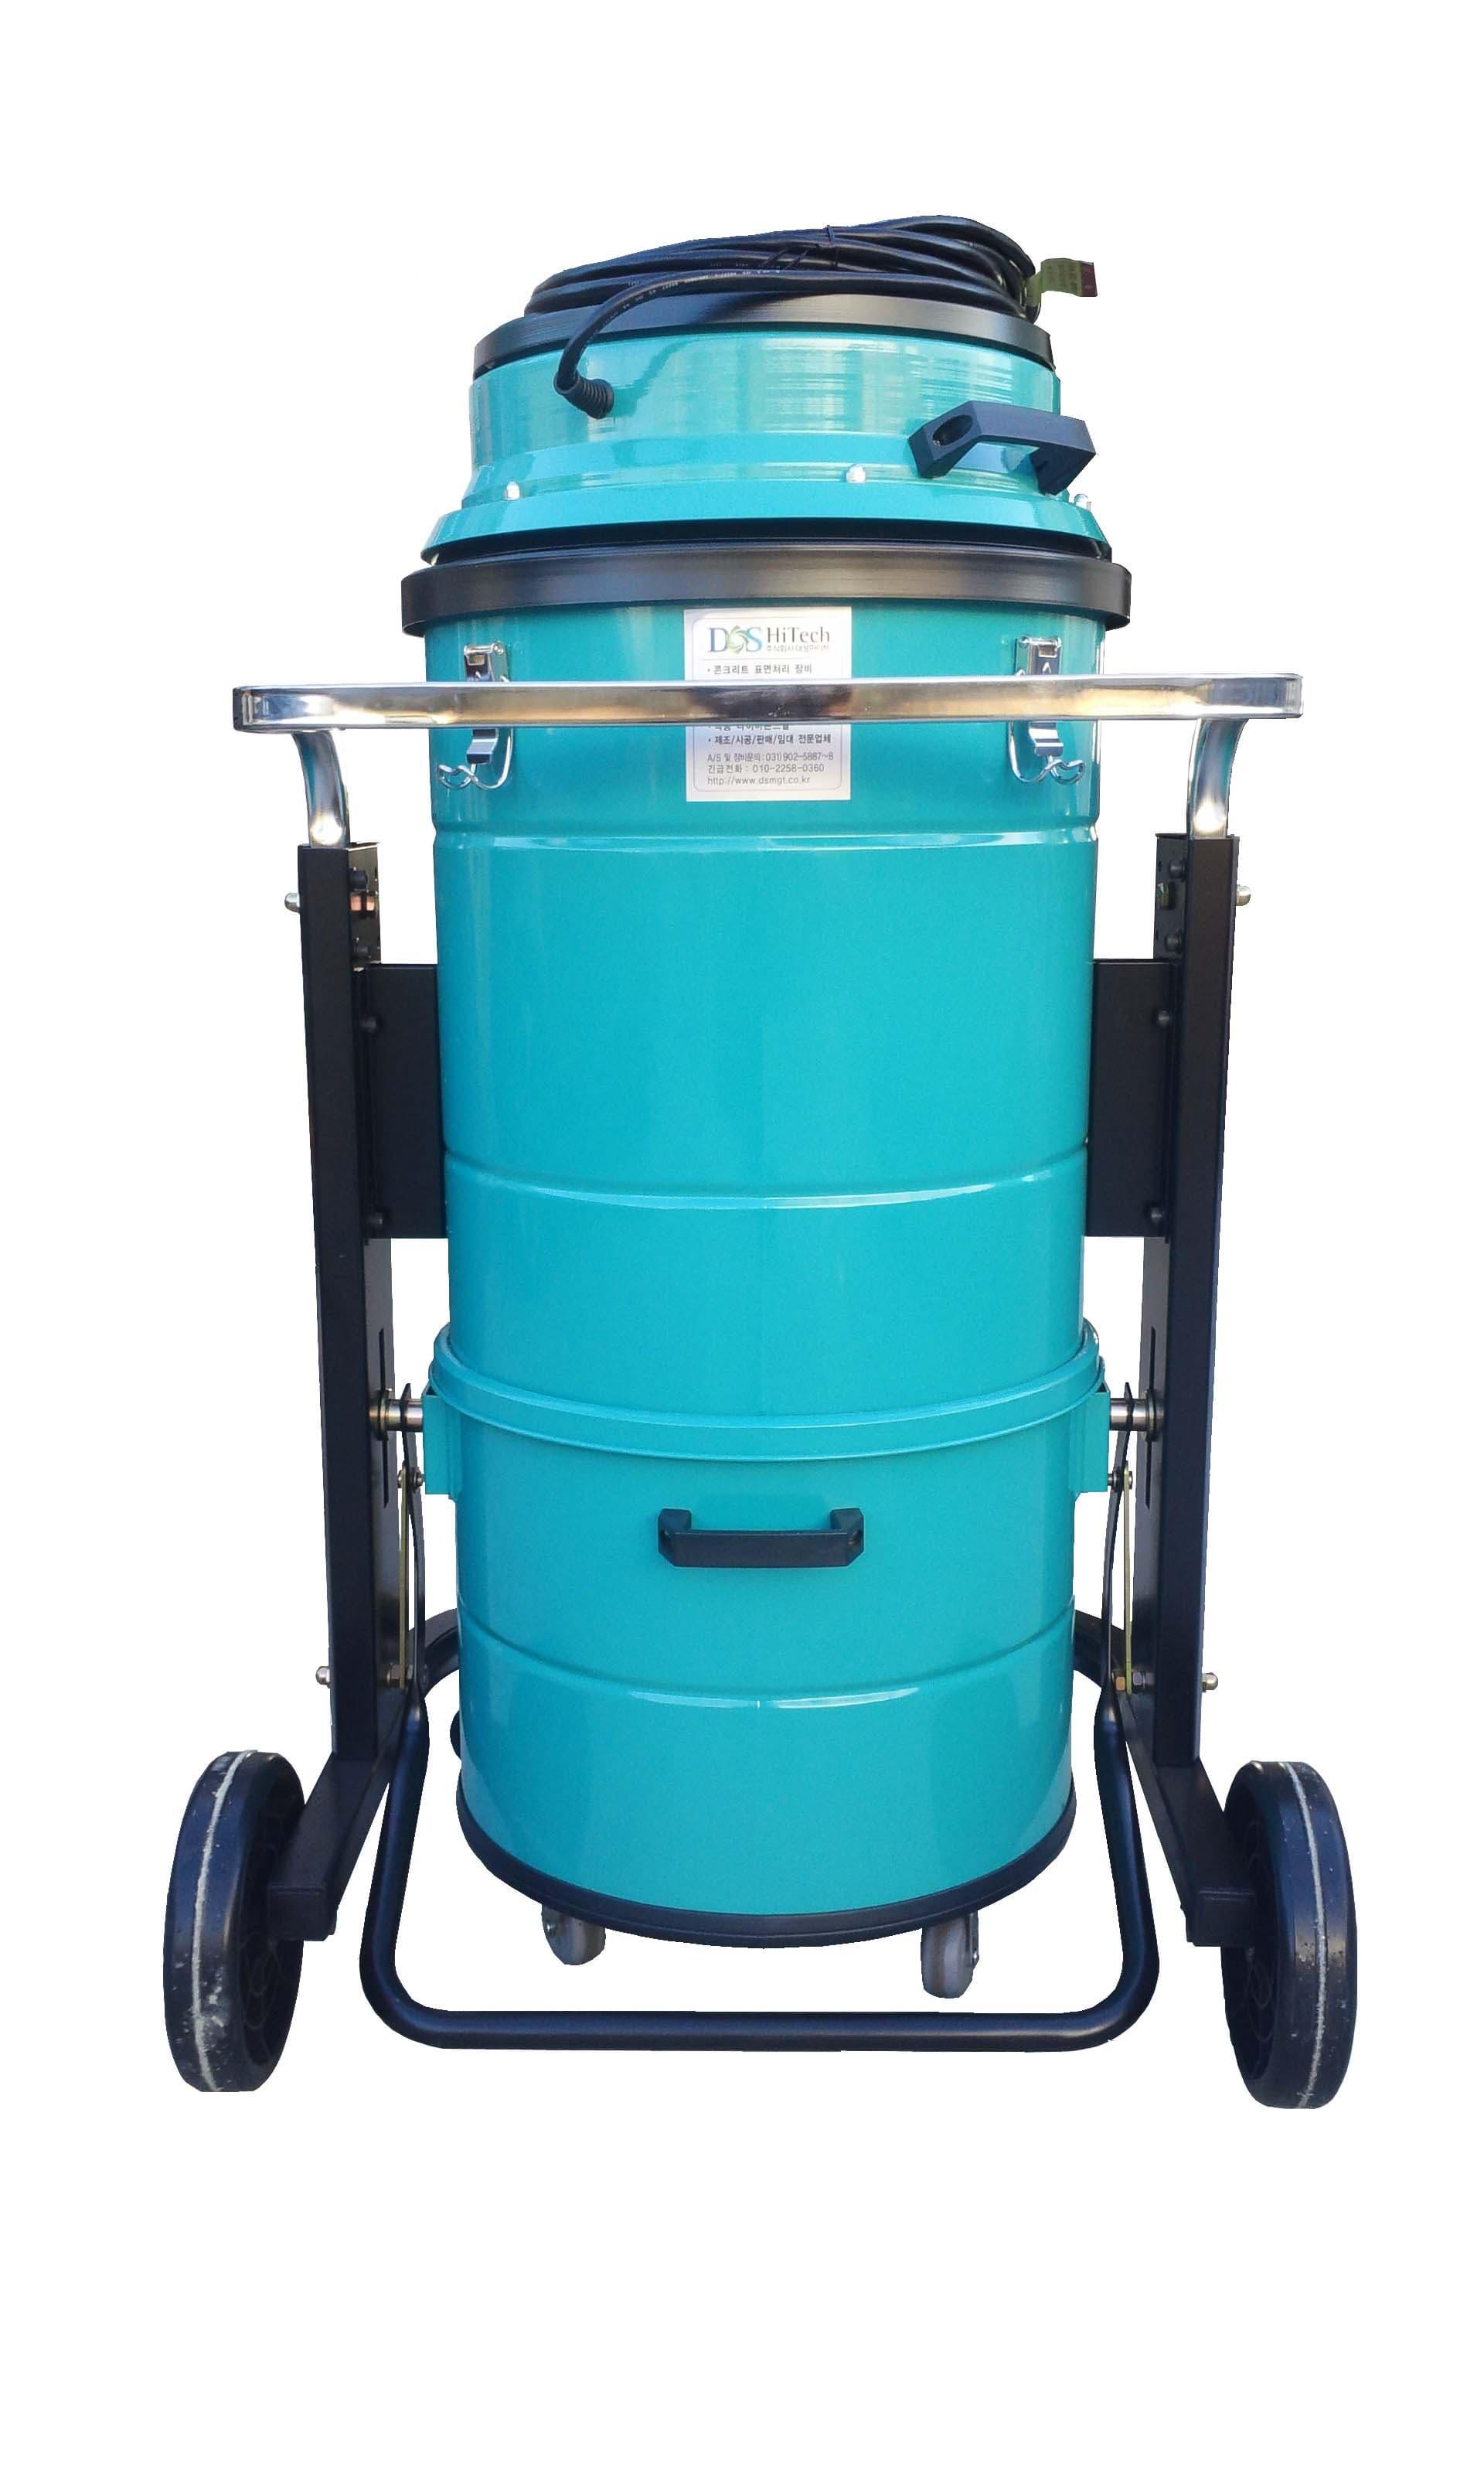 Industrial Vacuum Systems Manufacturers : Industrial vacuum cleaner